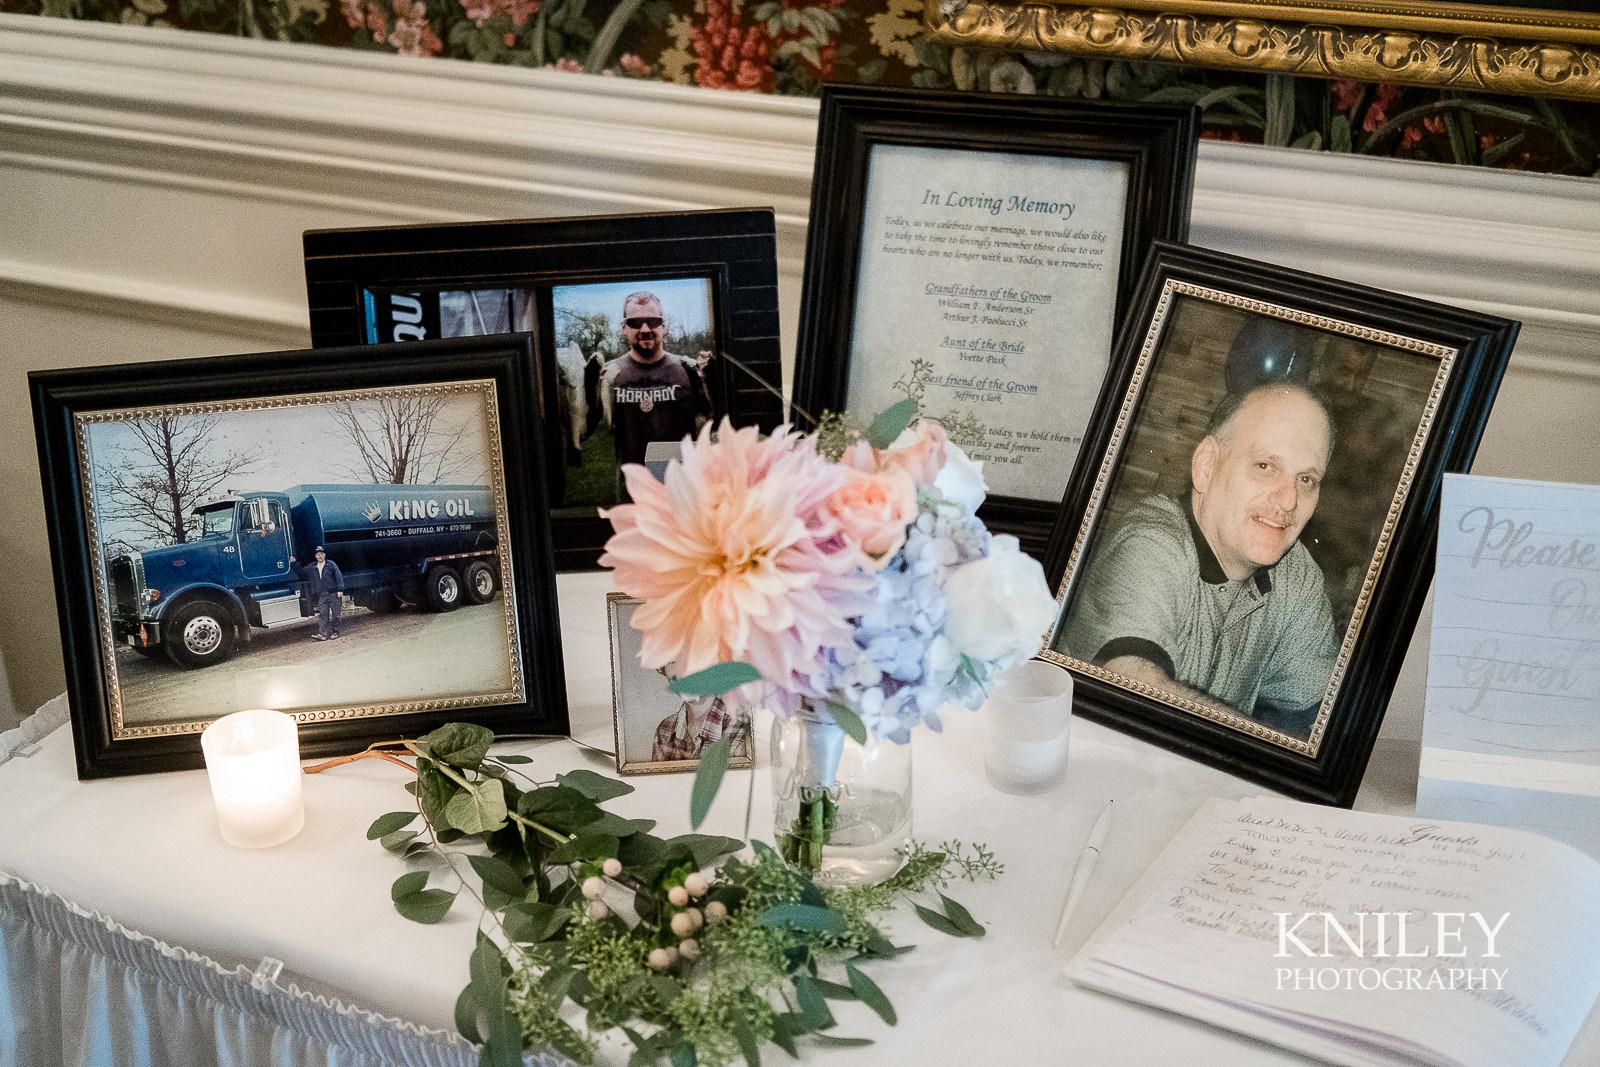 086 - Buffalo NY wedding pictures - Sean Patrick Restaurant Wedding Reception - Getzville - XT2A7381.jpg